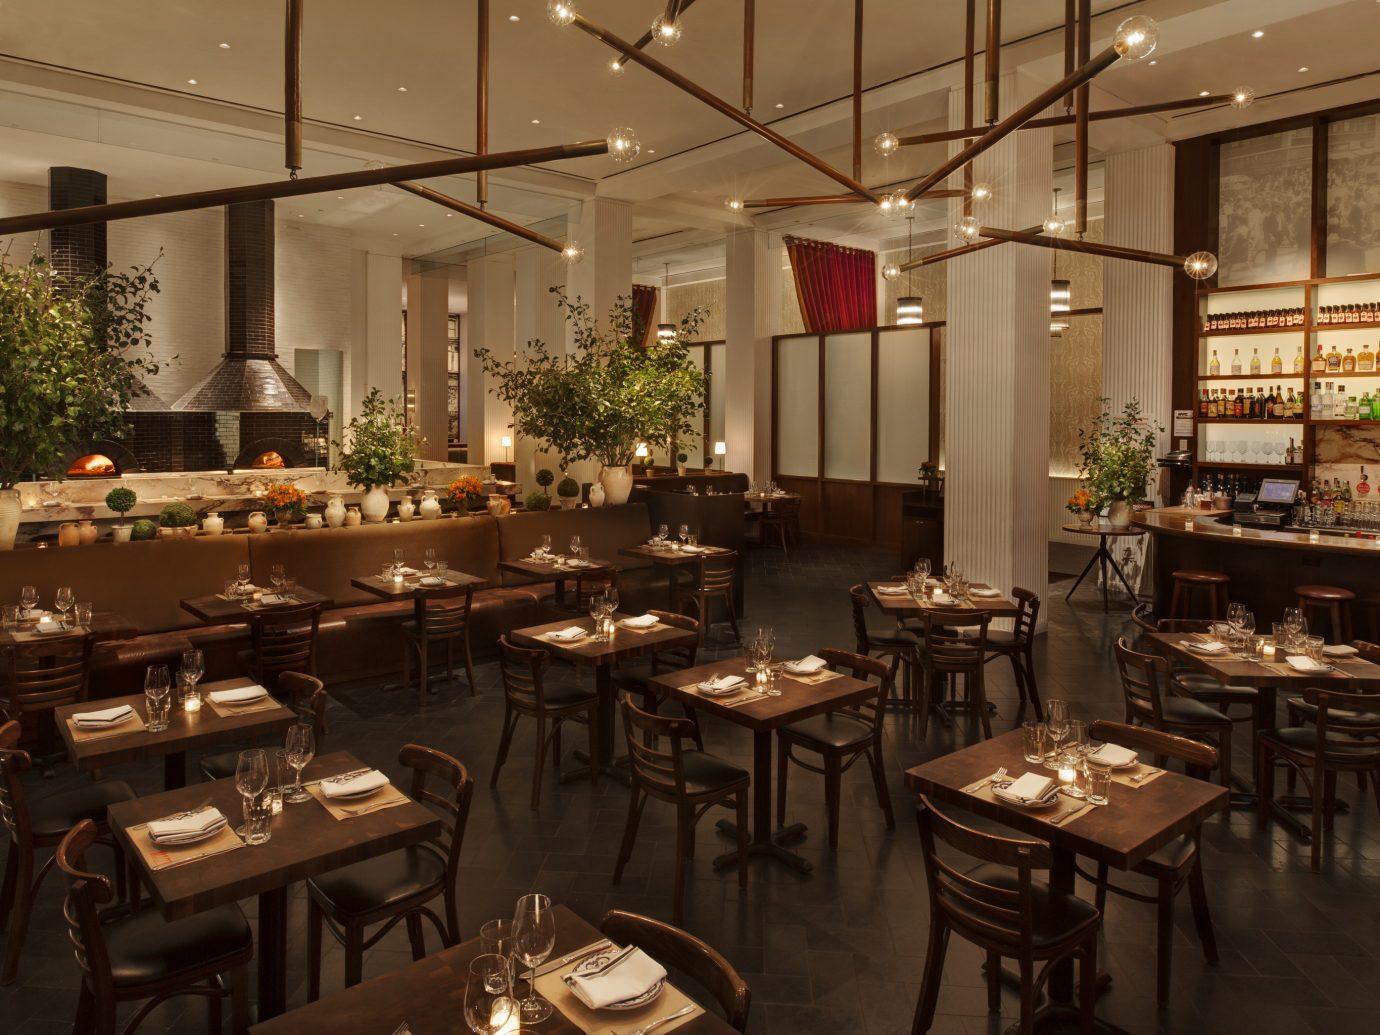 Restaurant at The Redbury, New York City